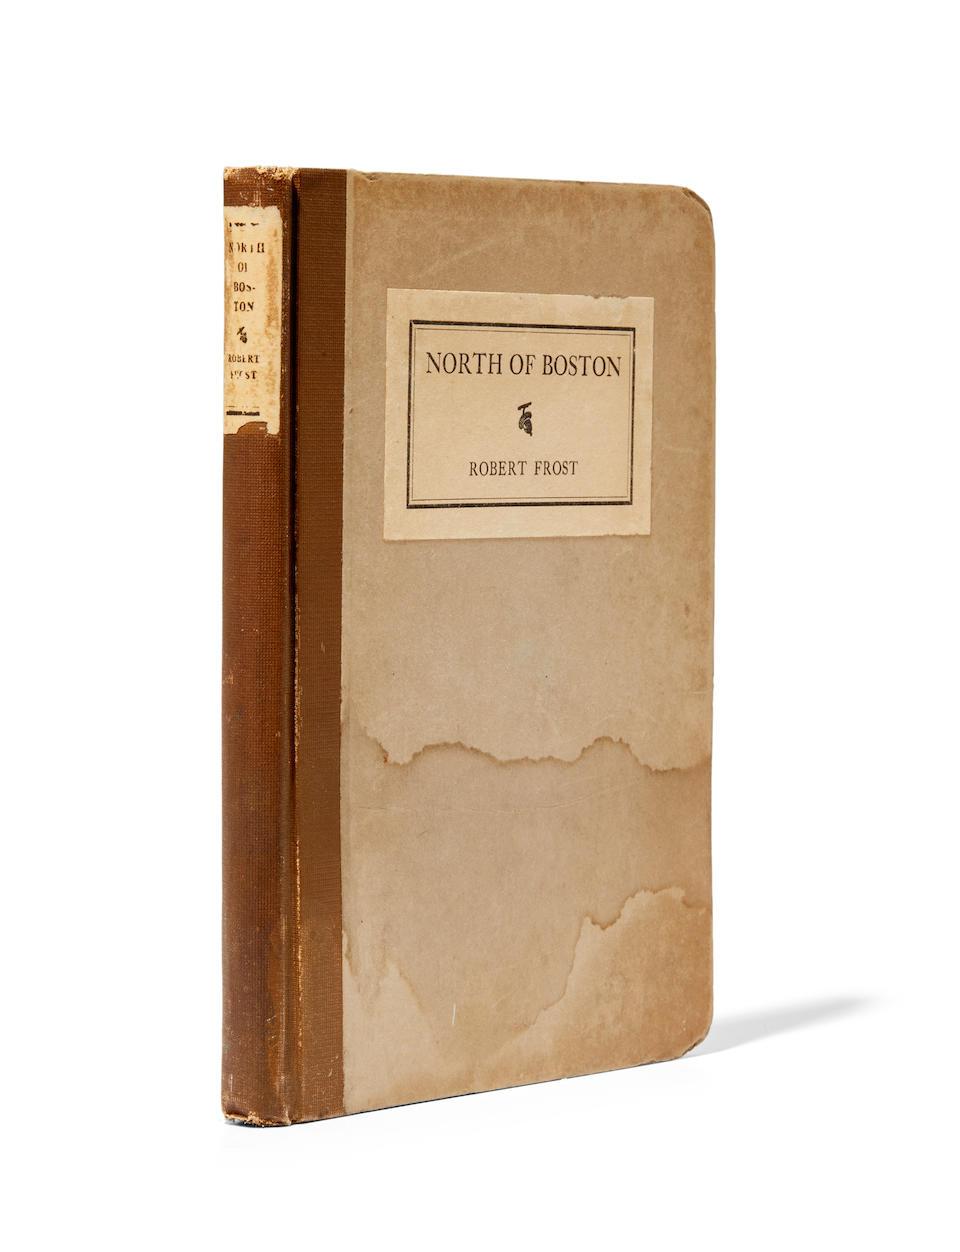 FROST, ROBERT. 1874-1963. North of Boston. New York: Henry Holt, 1914.